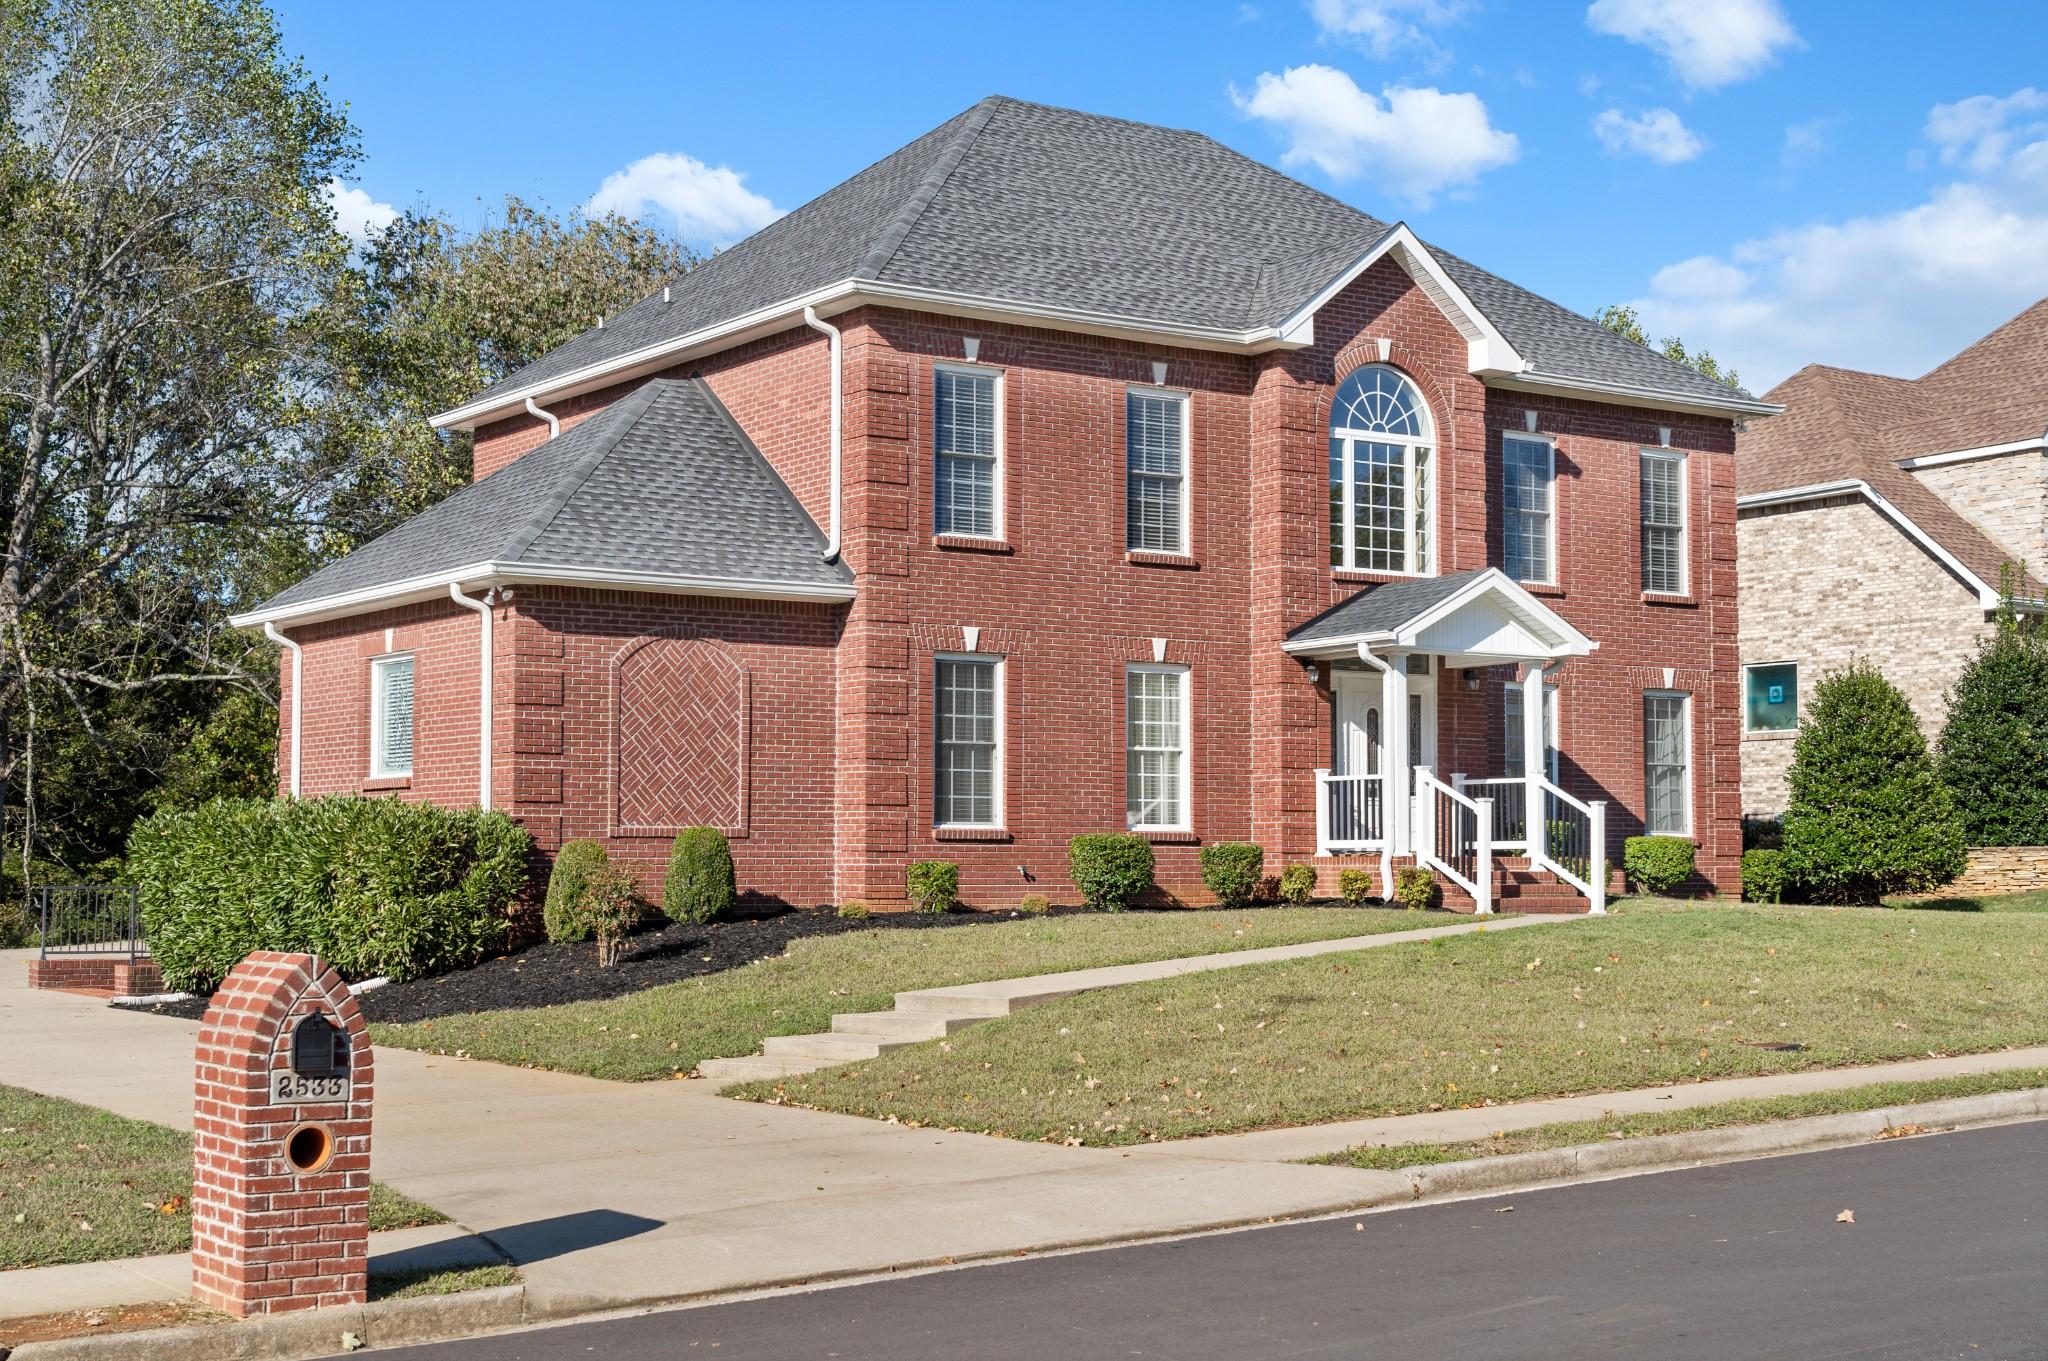 2533 Everwood Ct, Clarksville, TN 37043 - Clarksville, TN real estate listing